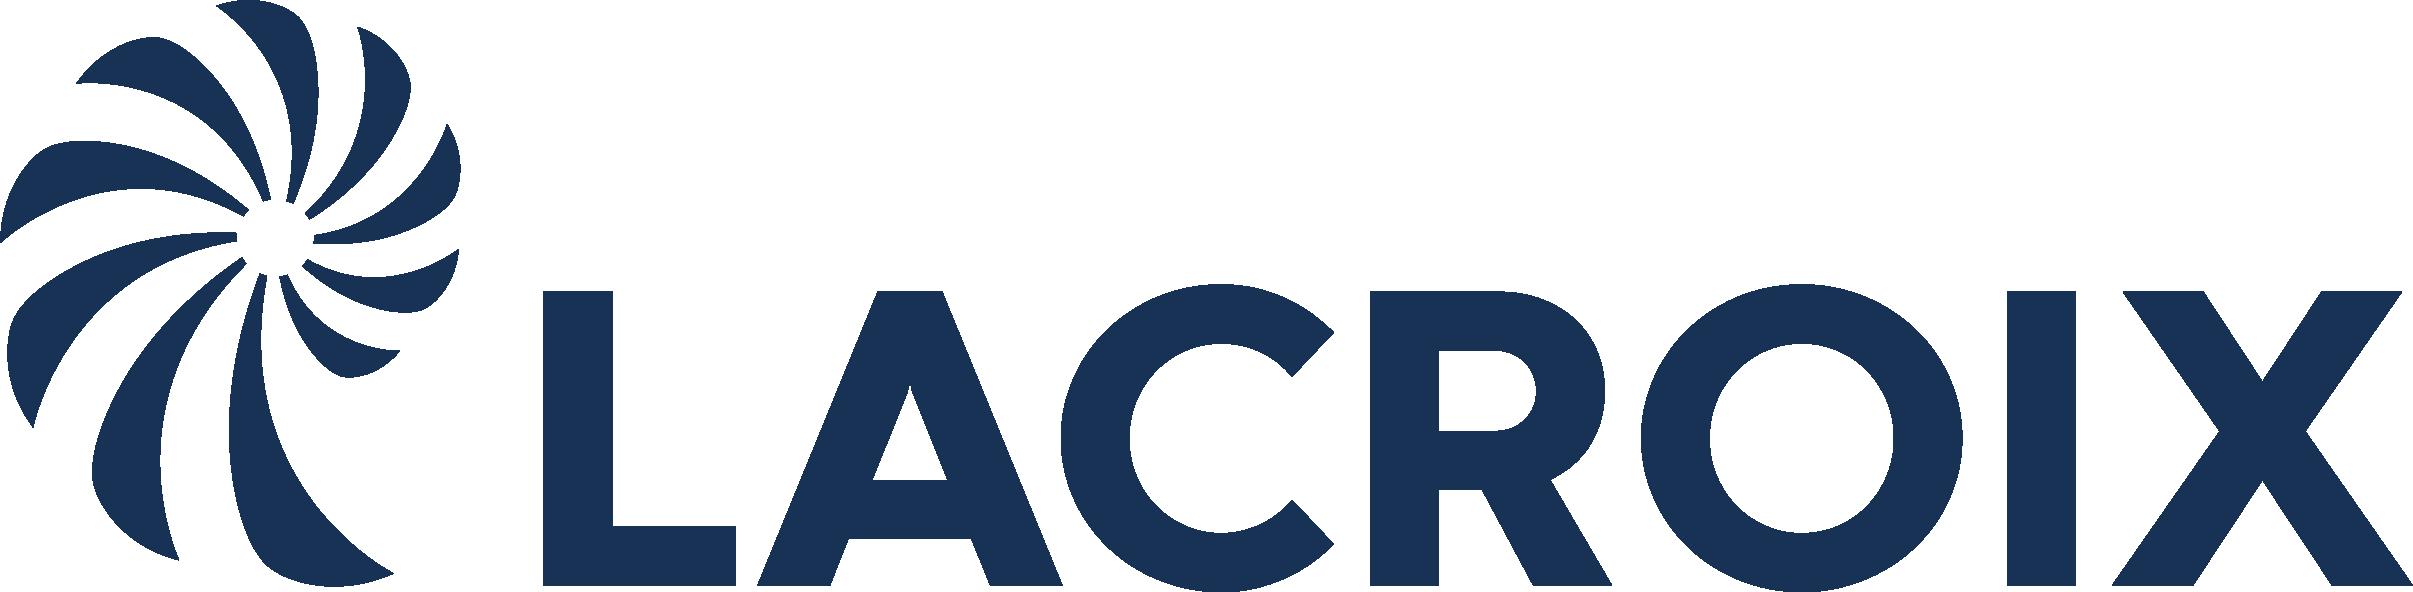 Fotografia Lacroix logo